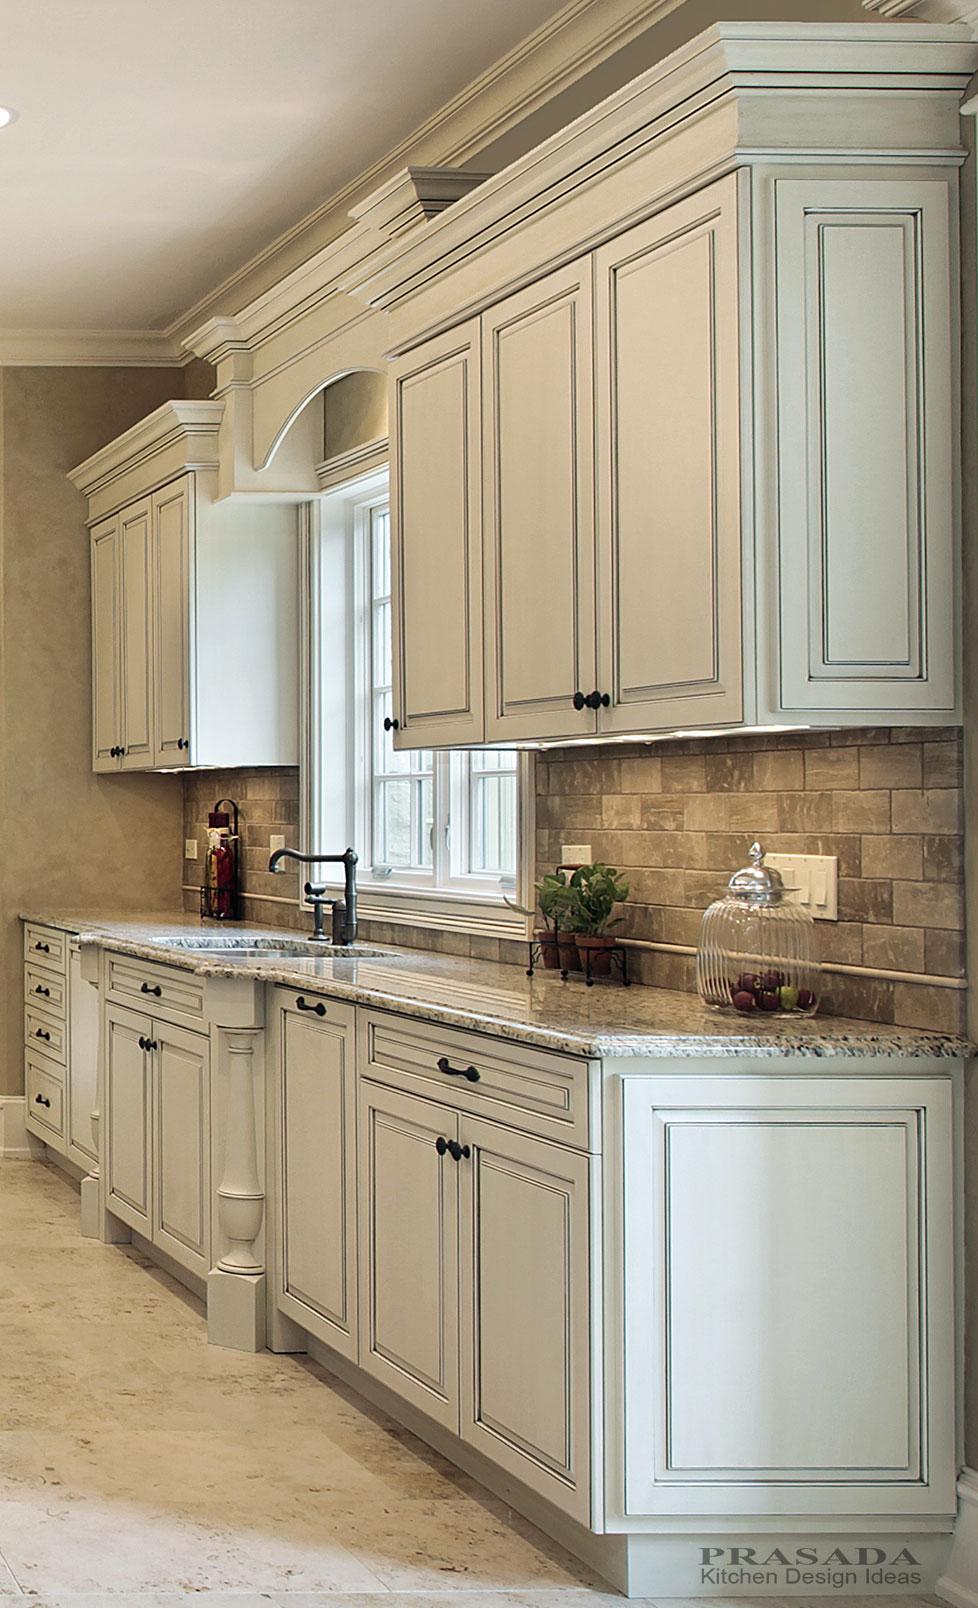 عکس آشپزخانه کلاسیک2